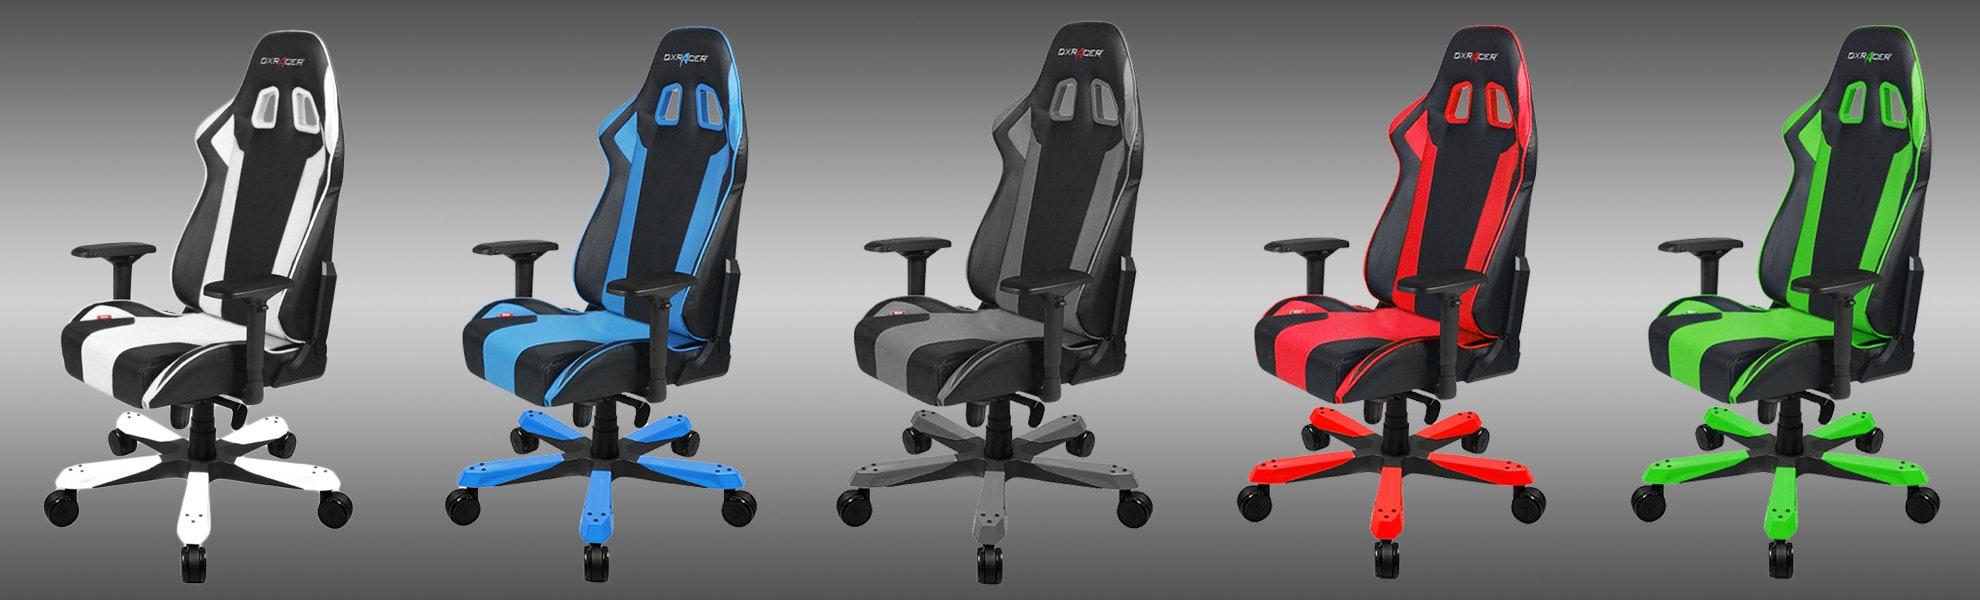 DXRacer King Series Chair OH/KS06